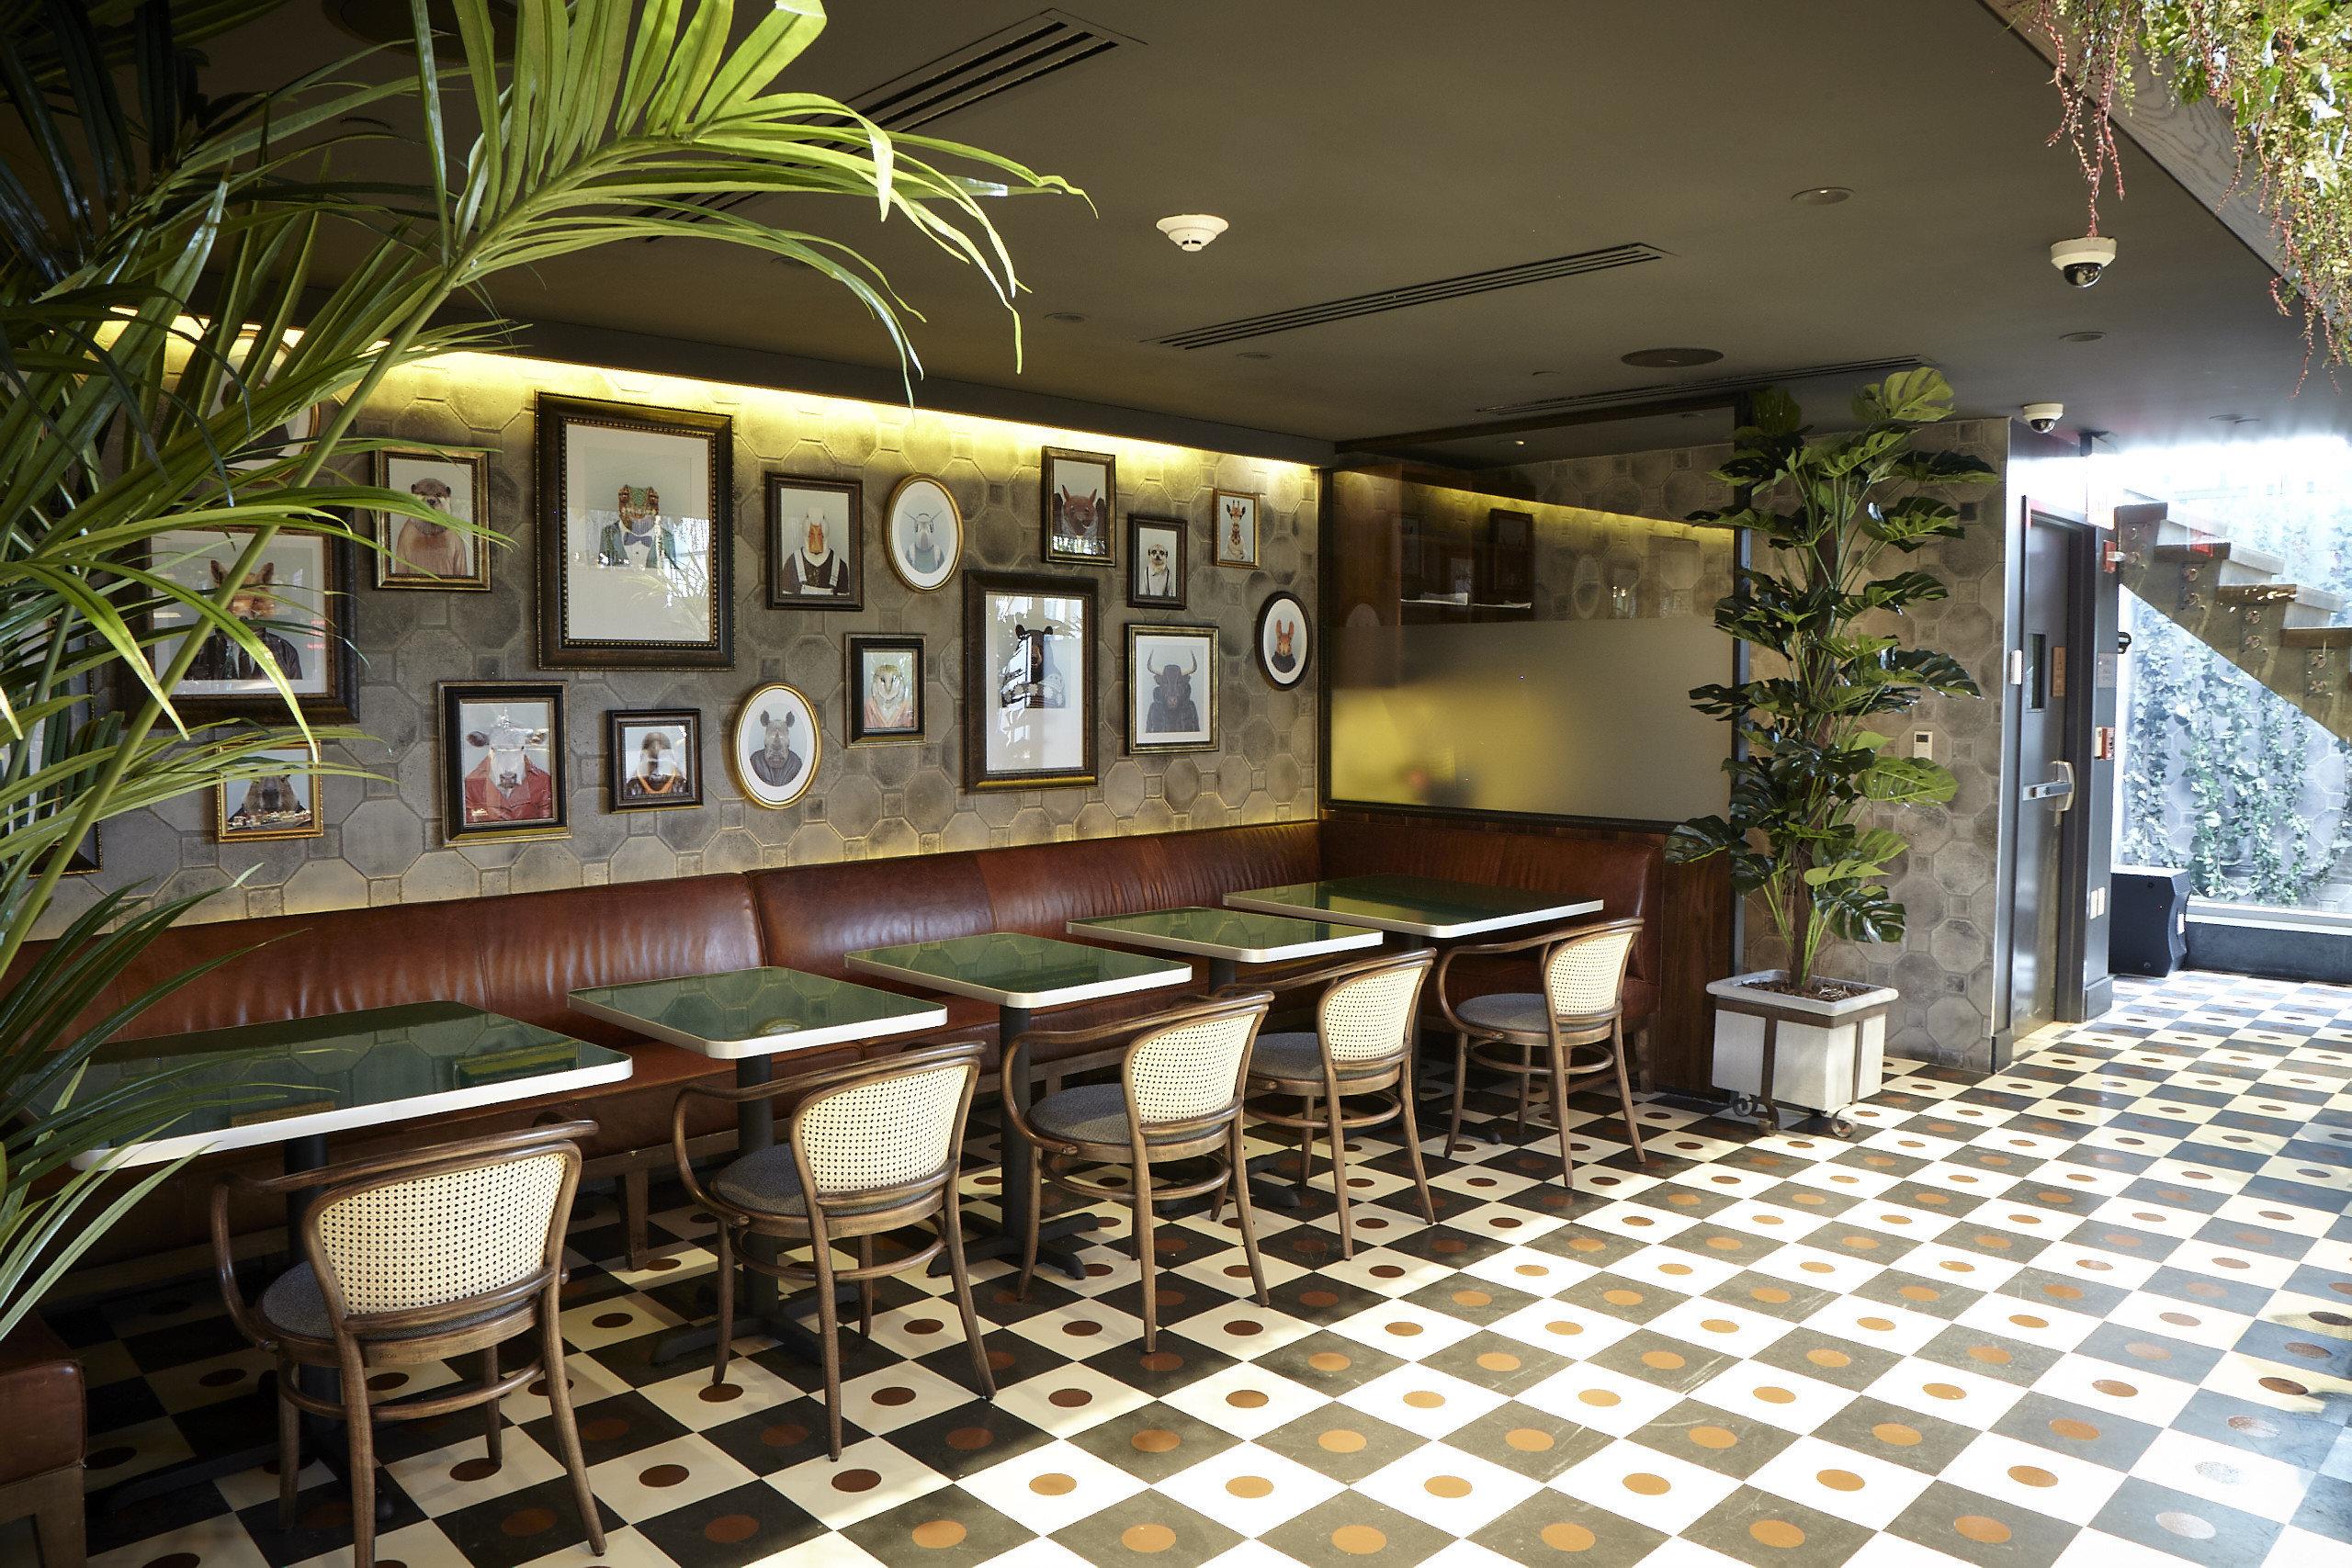 property restaurant Lobby Bar Resort function hall café tiled